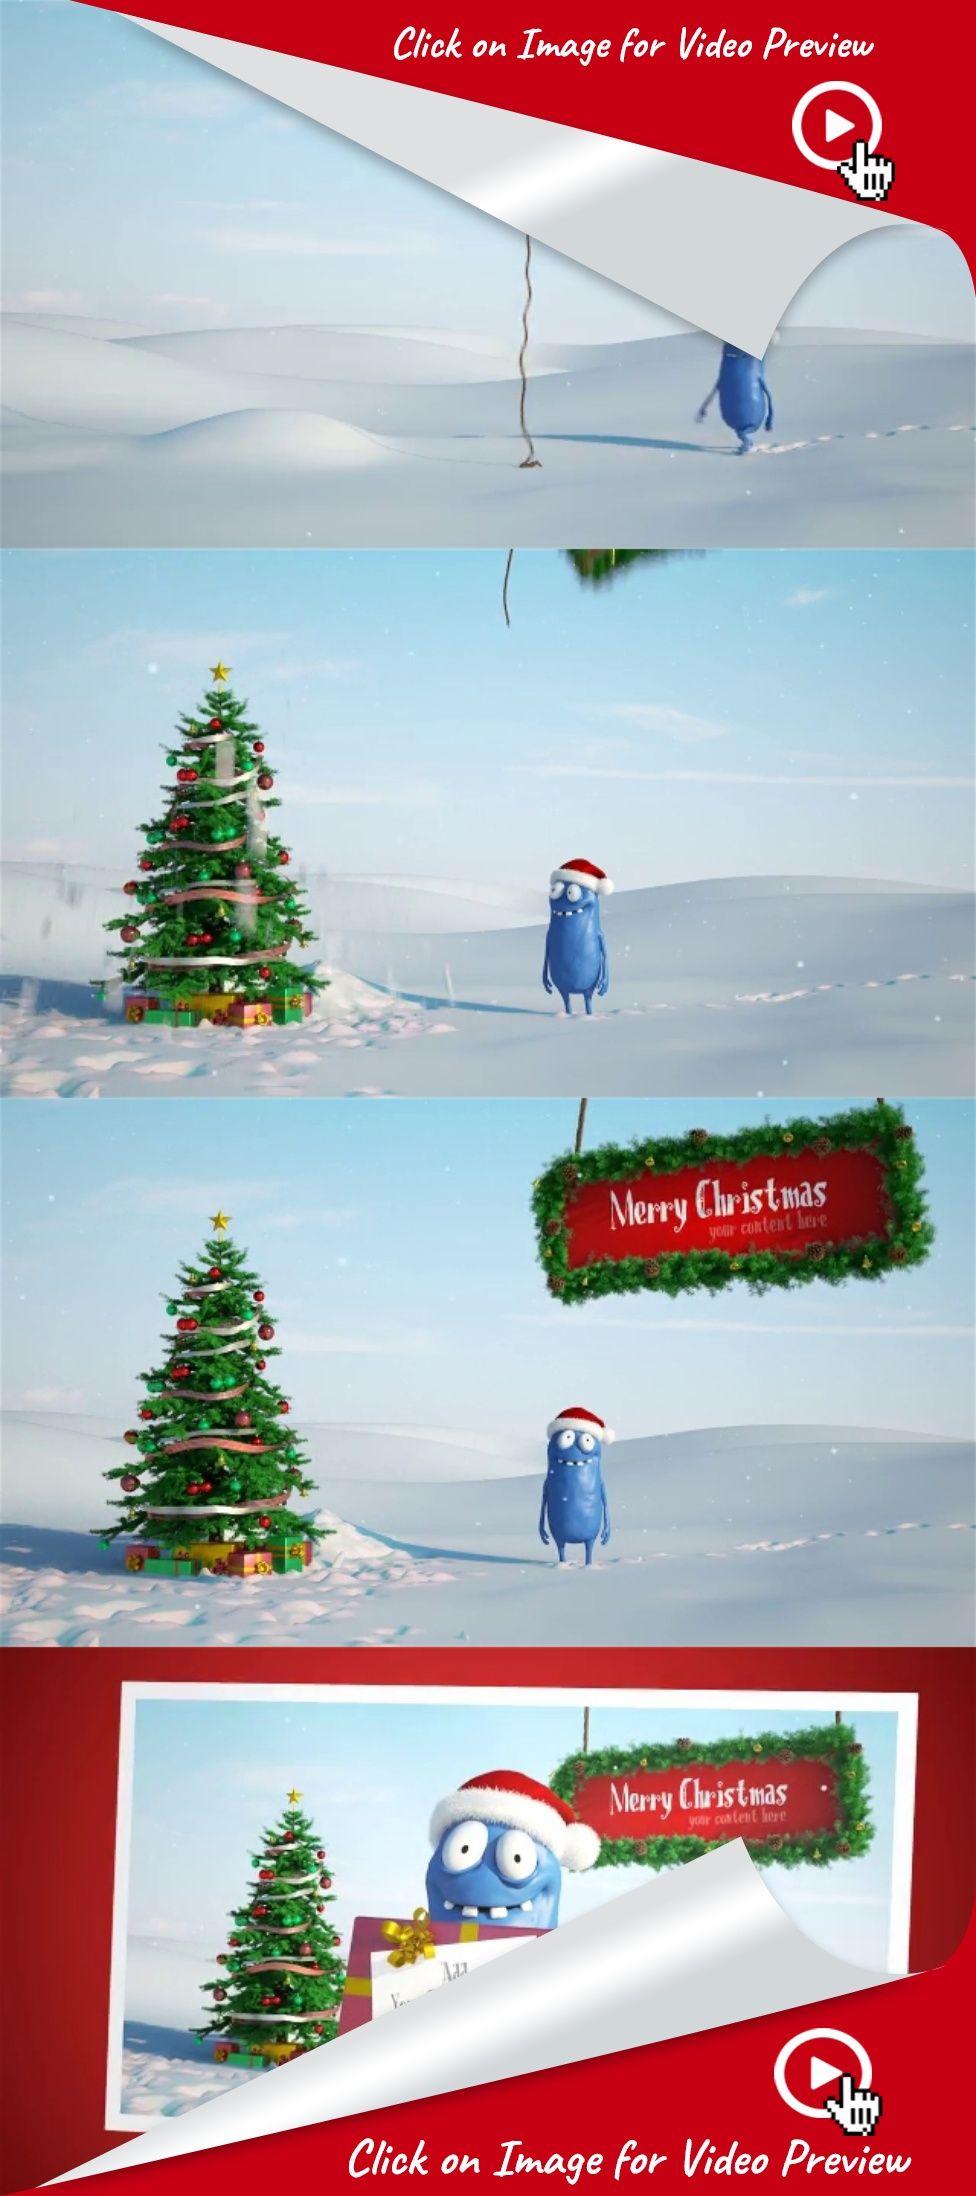 Christmas Bobby 2 xmas Pinterest